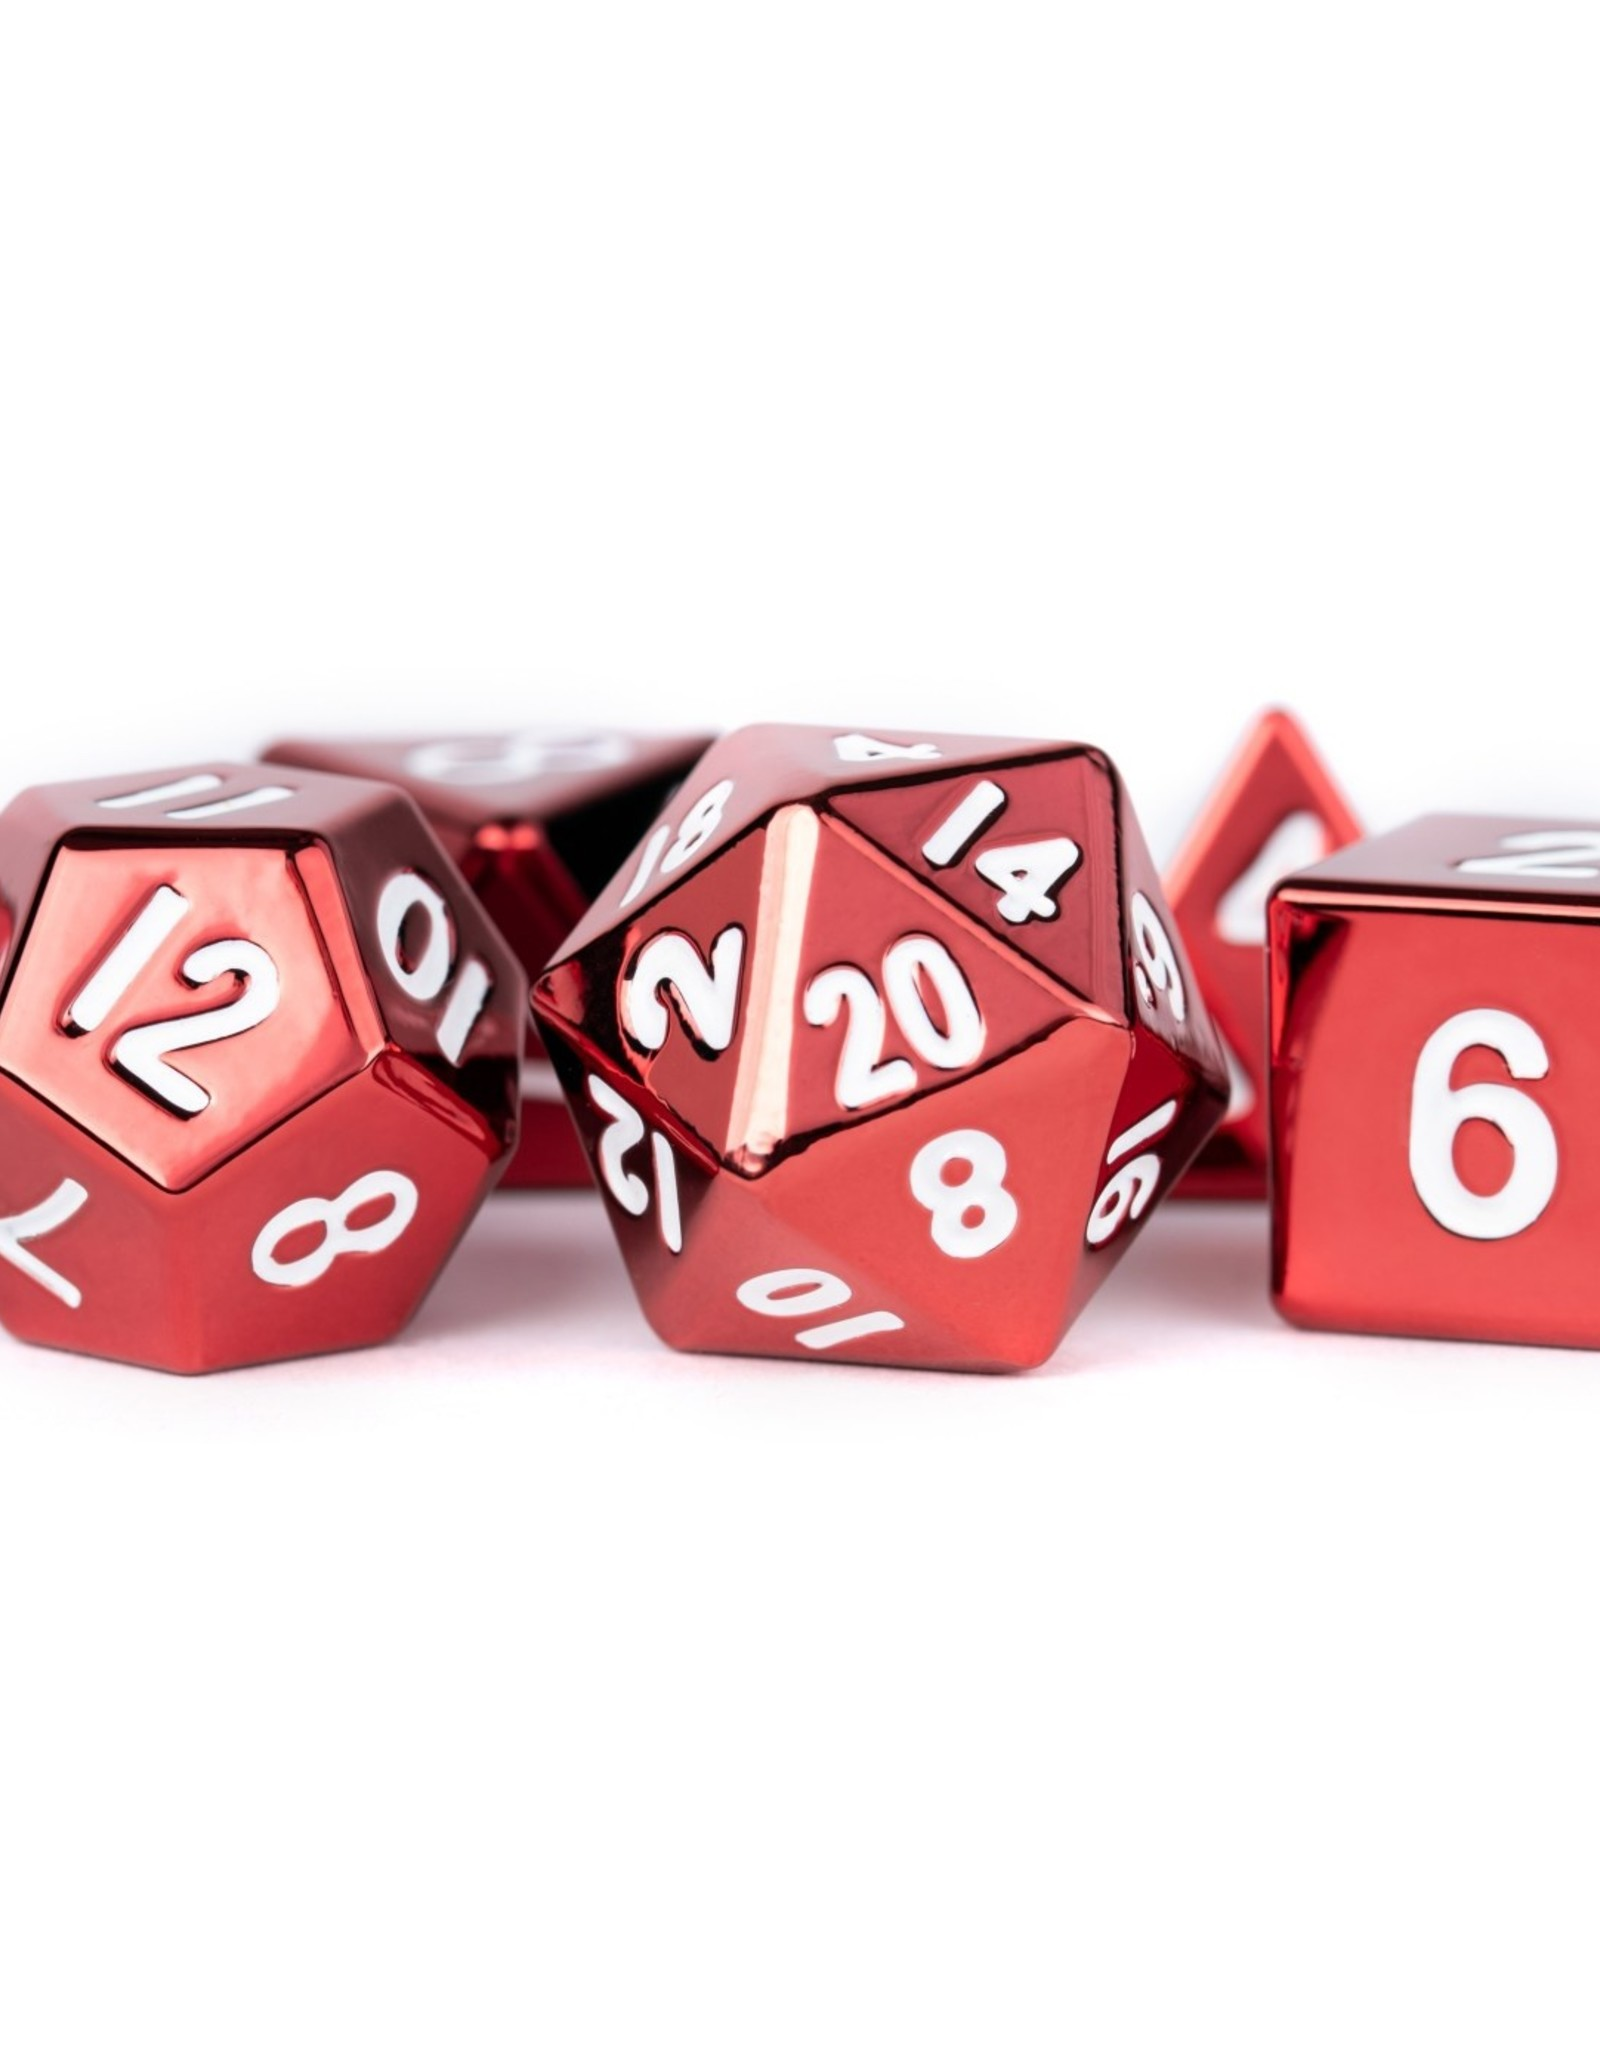 Metallic Dice Games Poly Metal Dice Set Red